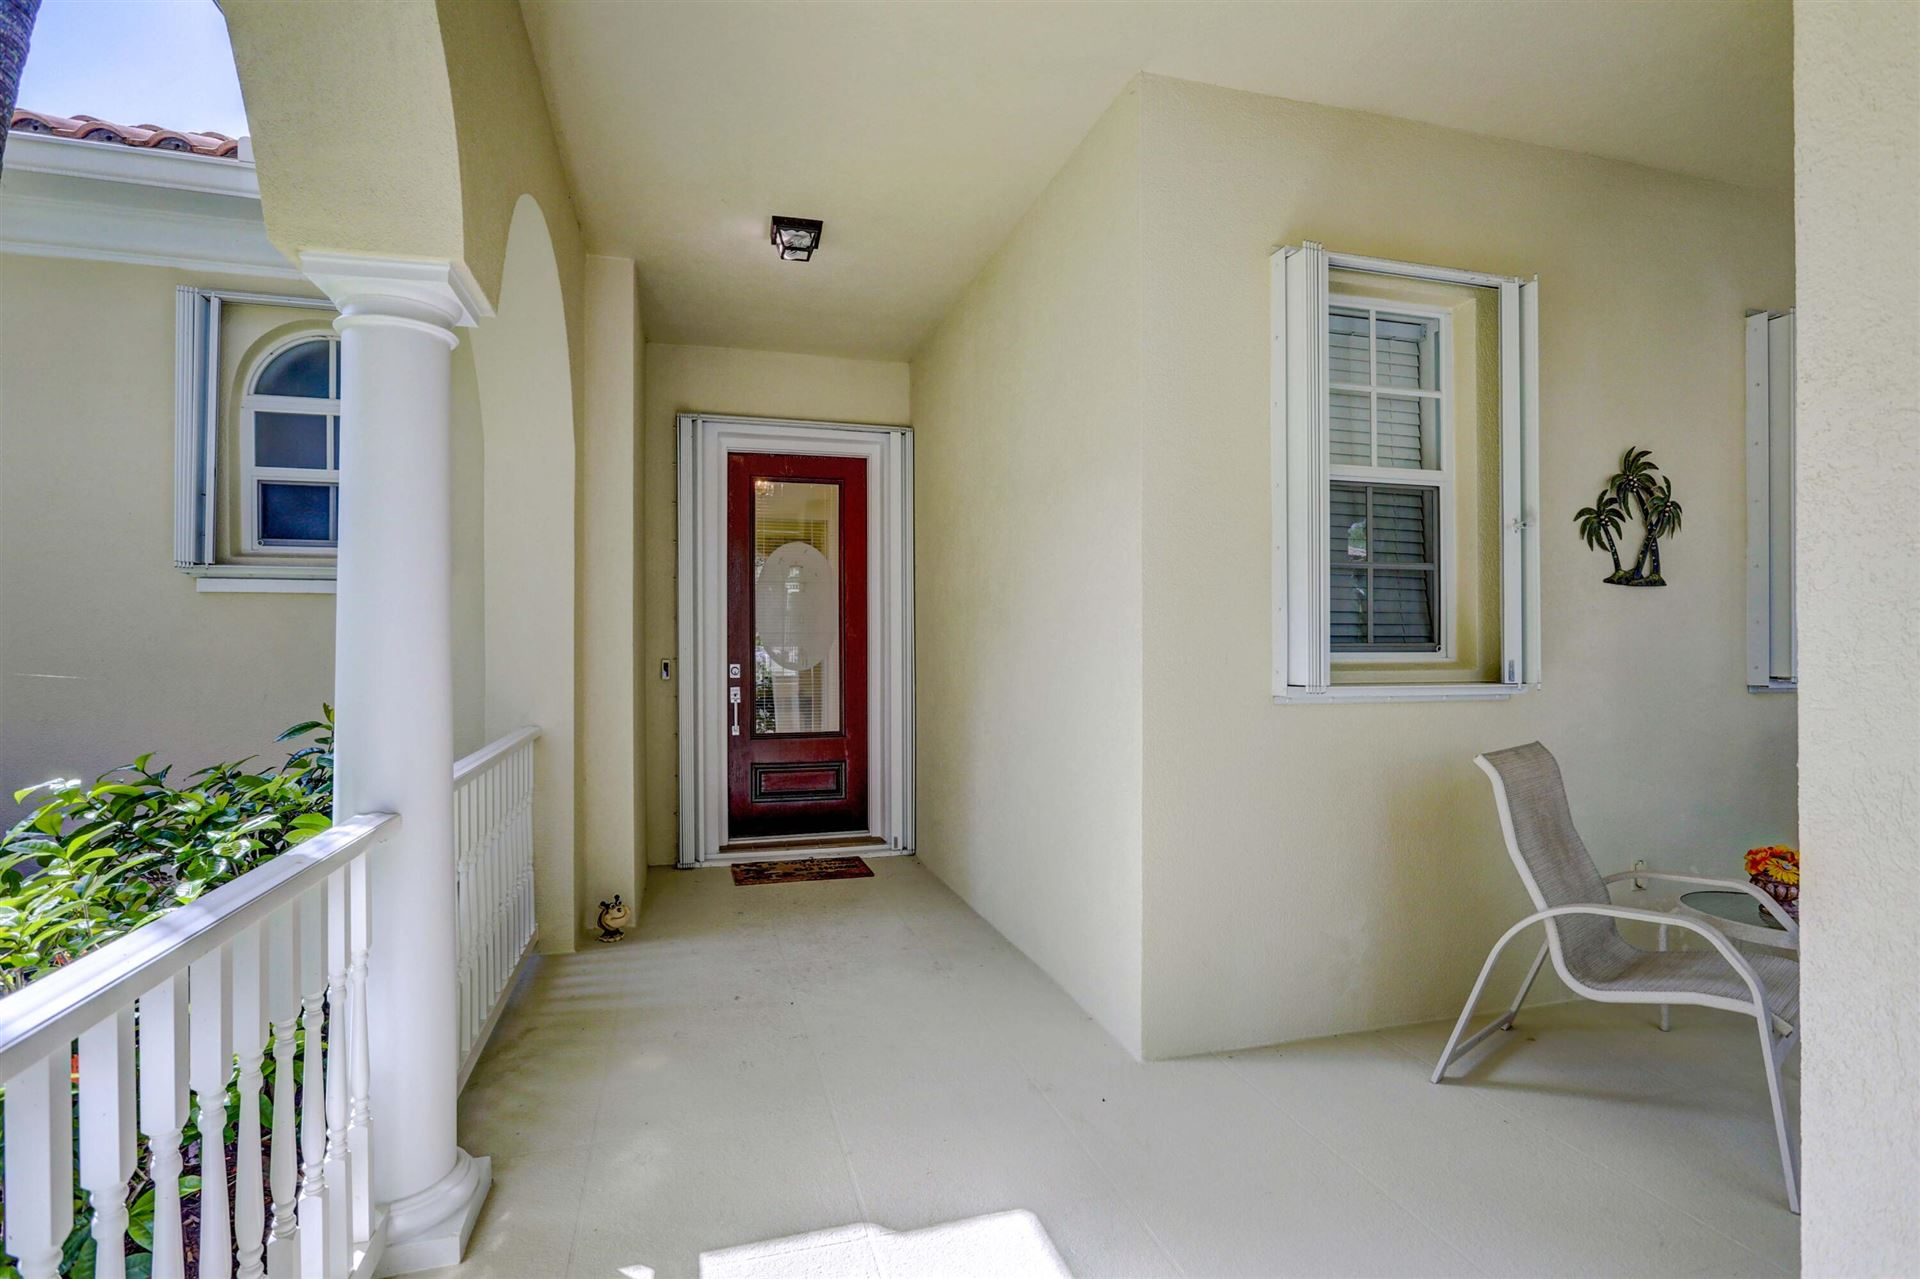 Photo of 205 Florence Drive, Jupiter, FL 33458 (MLS # RX-10744060)